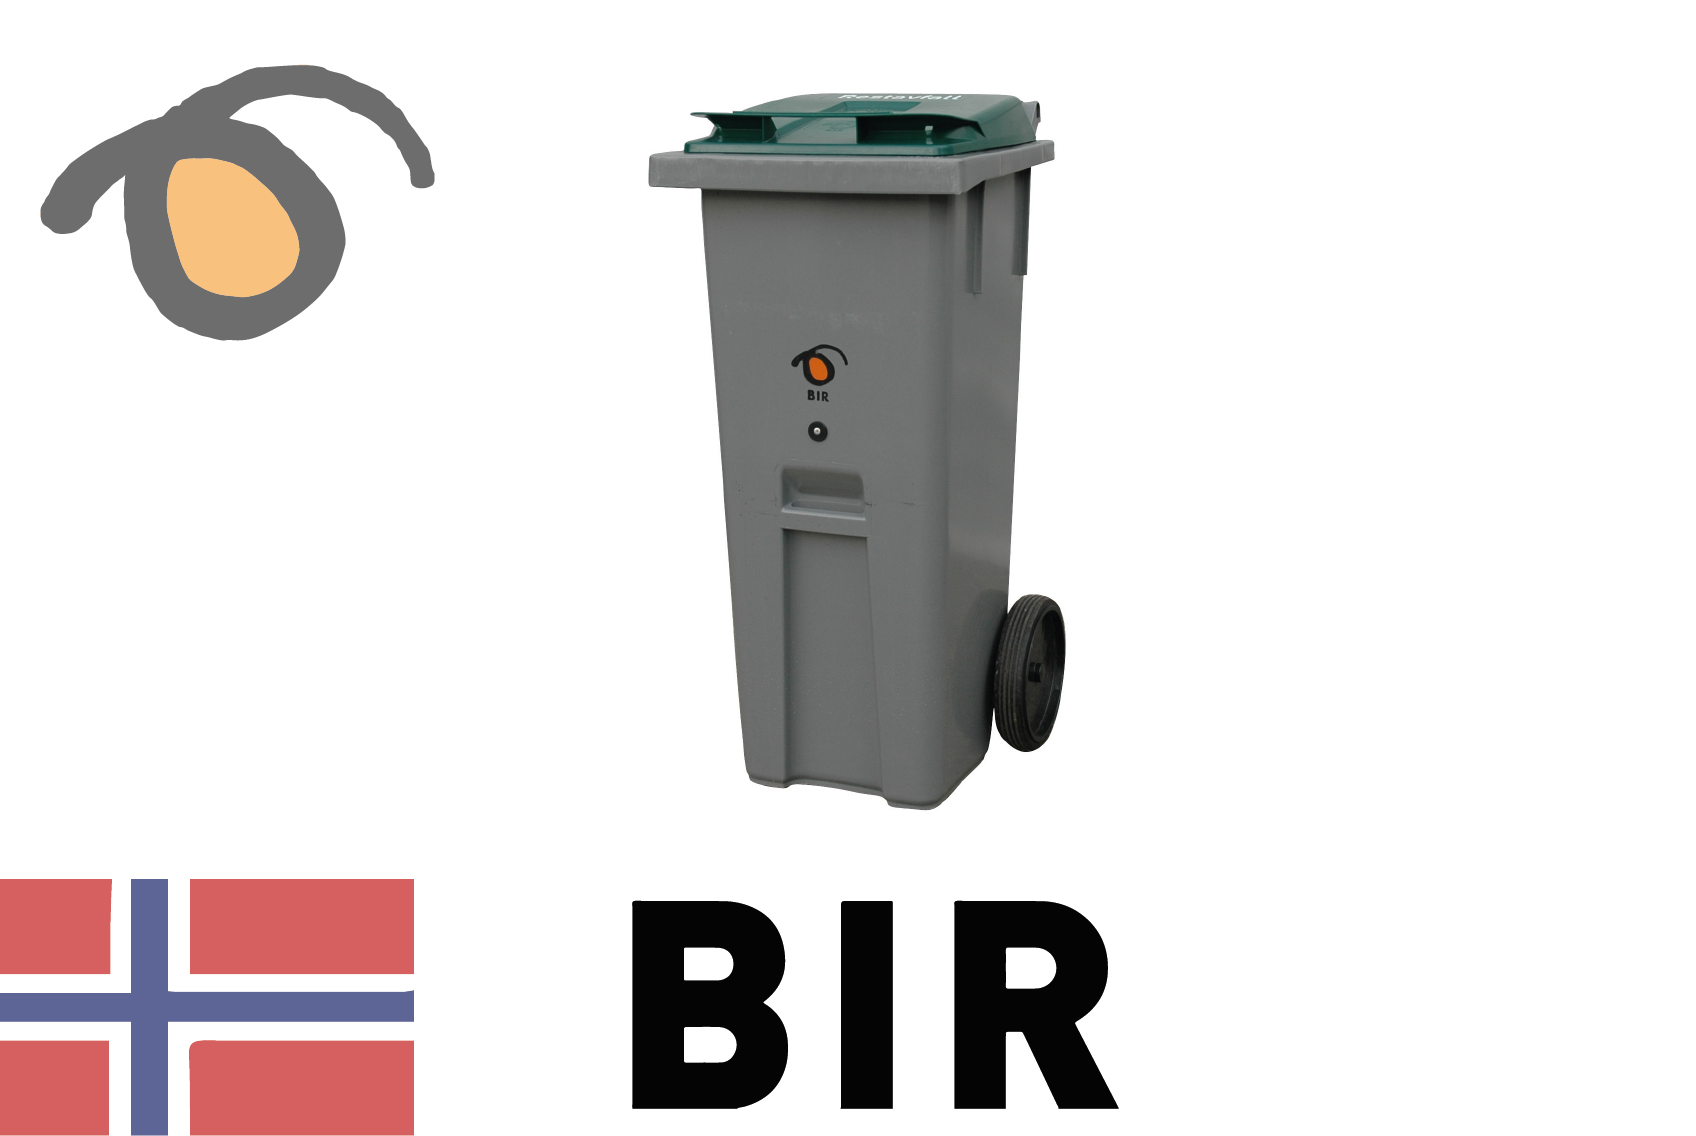 #2 BIR - Changing disposal behaviour through flexible fees - CIRCit Nord